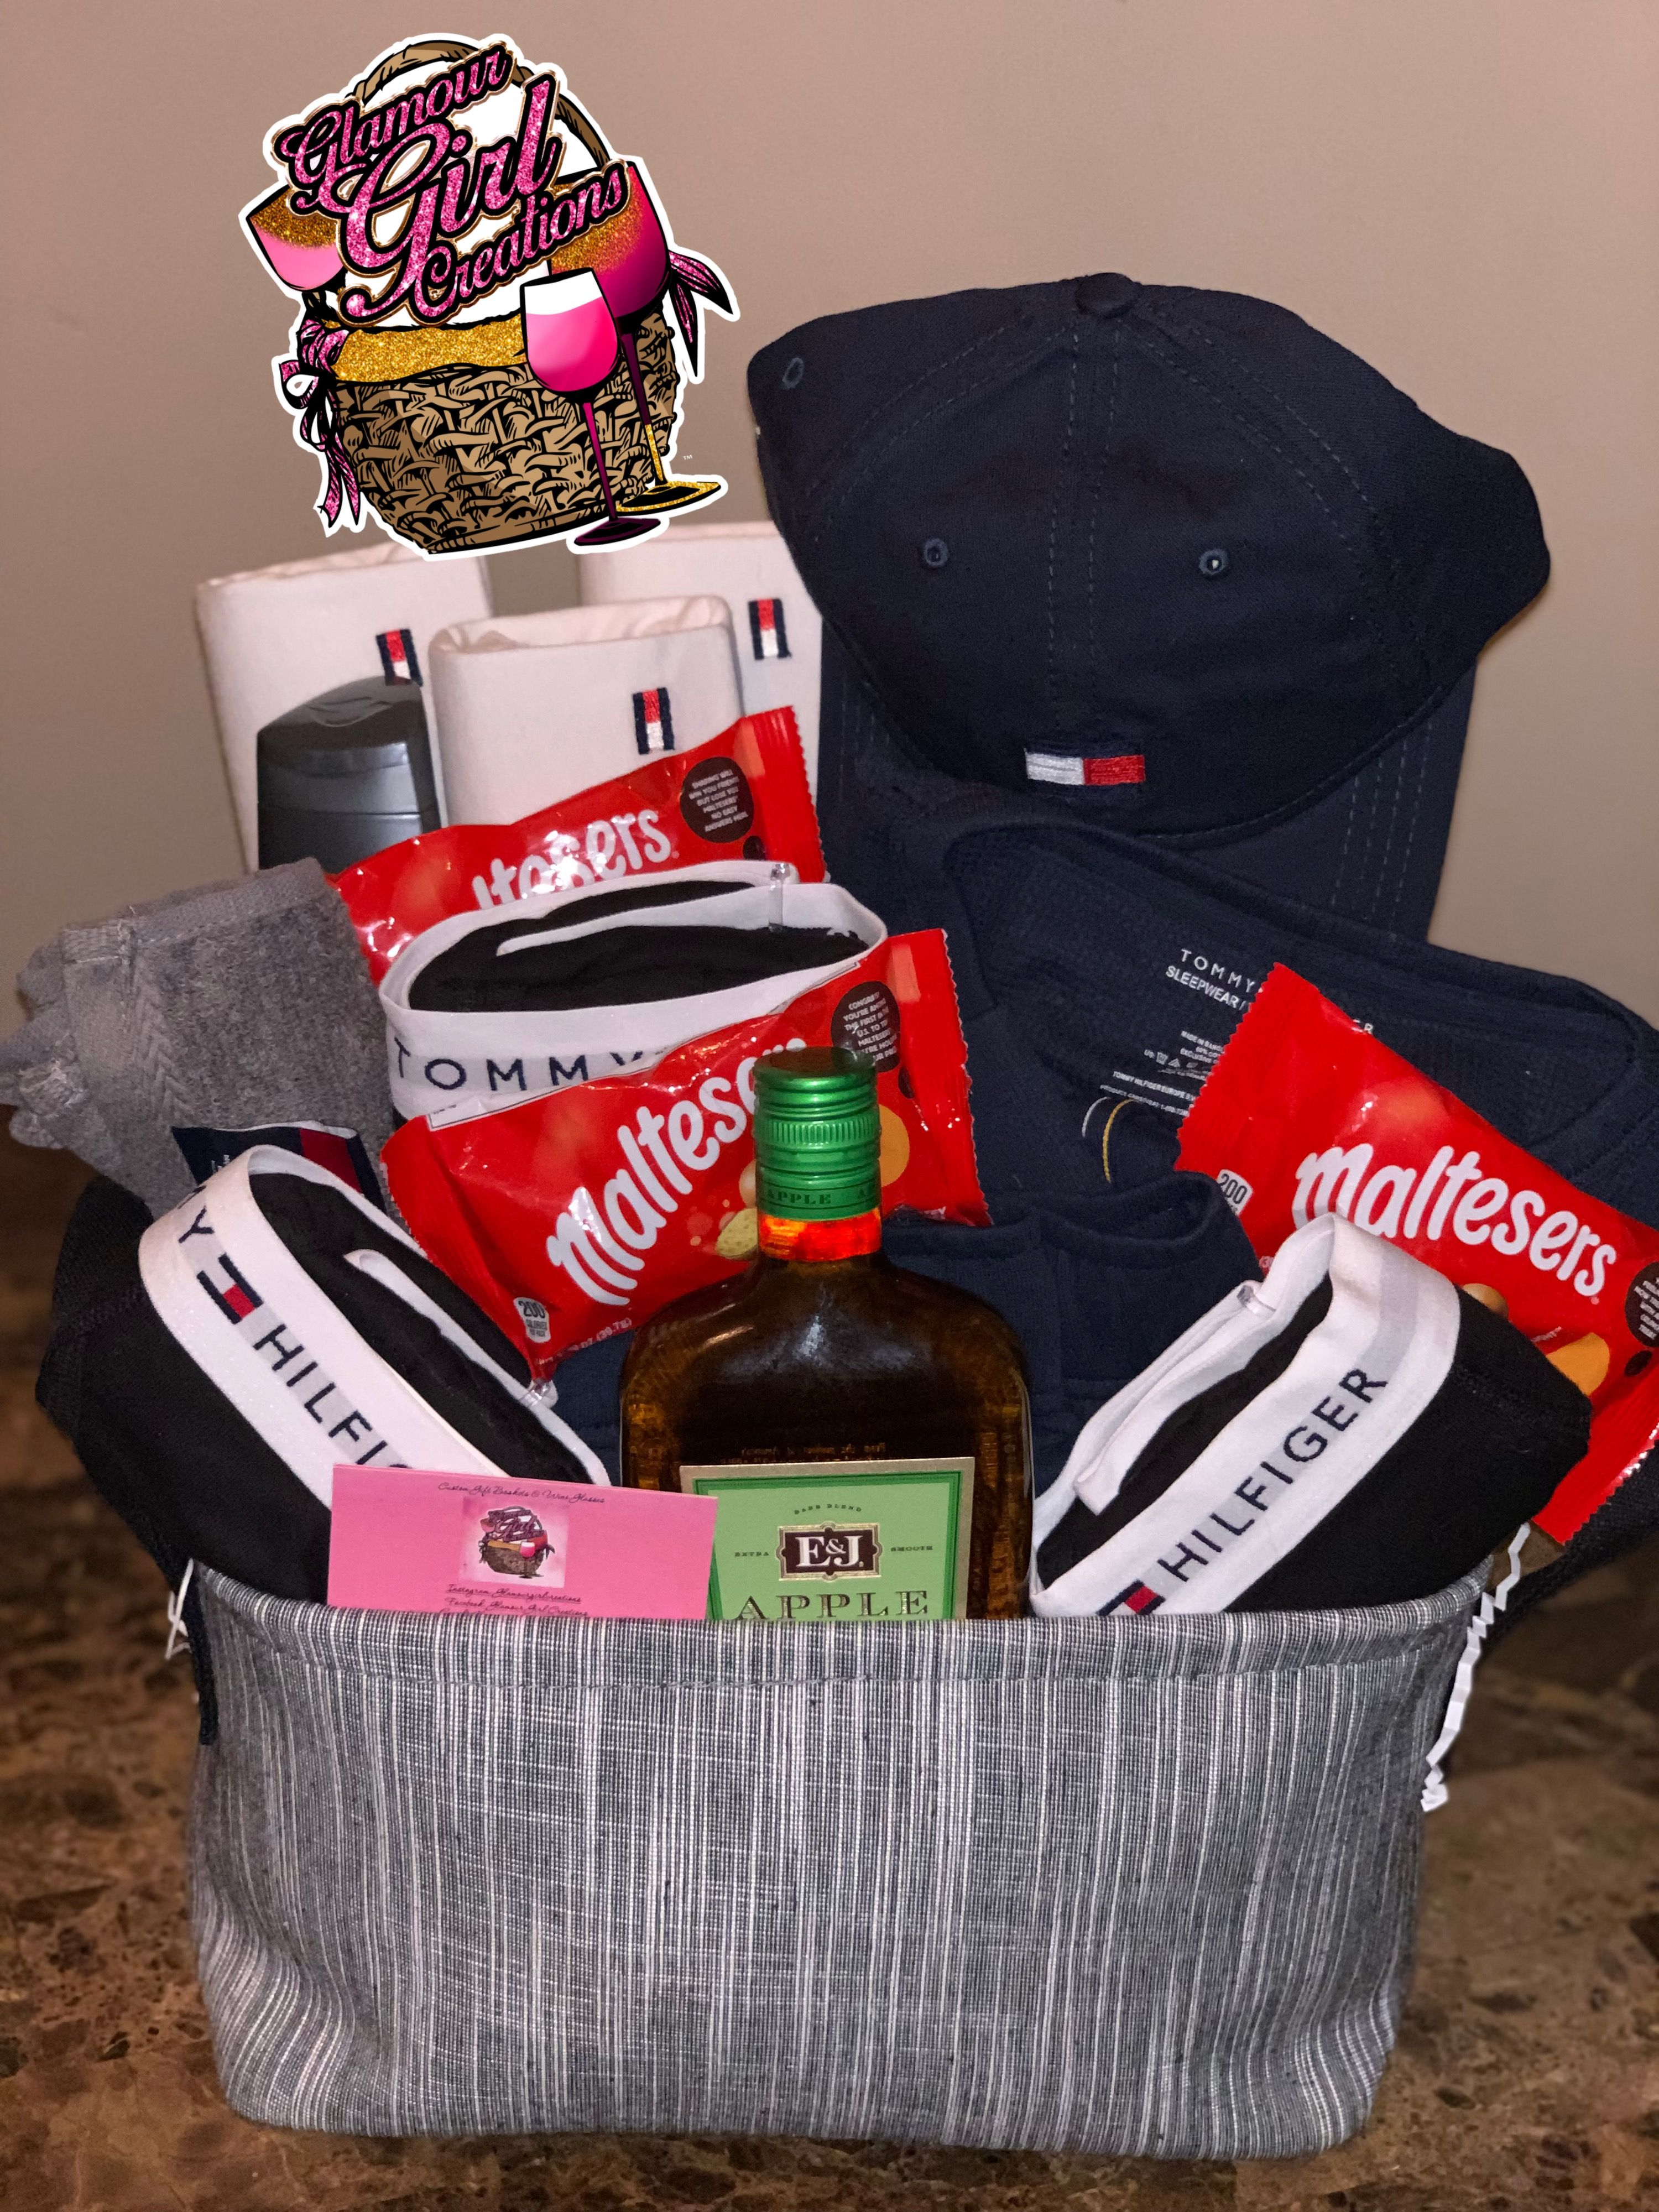 Pin By Mari On Boyfriend Boyfriend Gift Basket Gift Baskets For Him Boyfriend Gifts